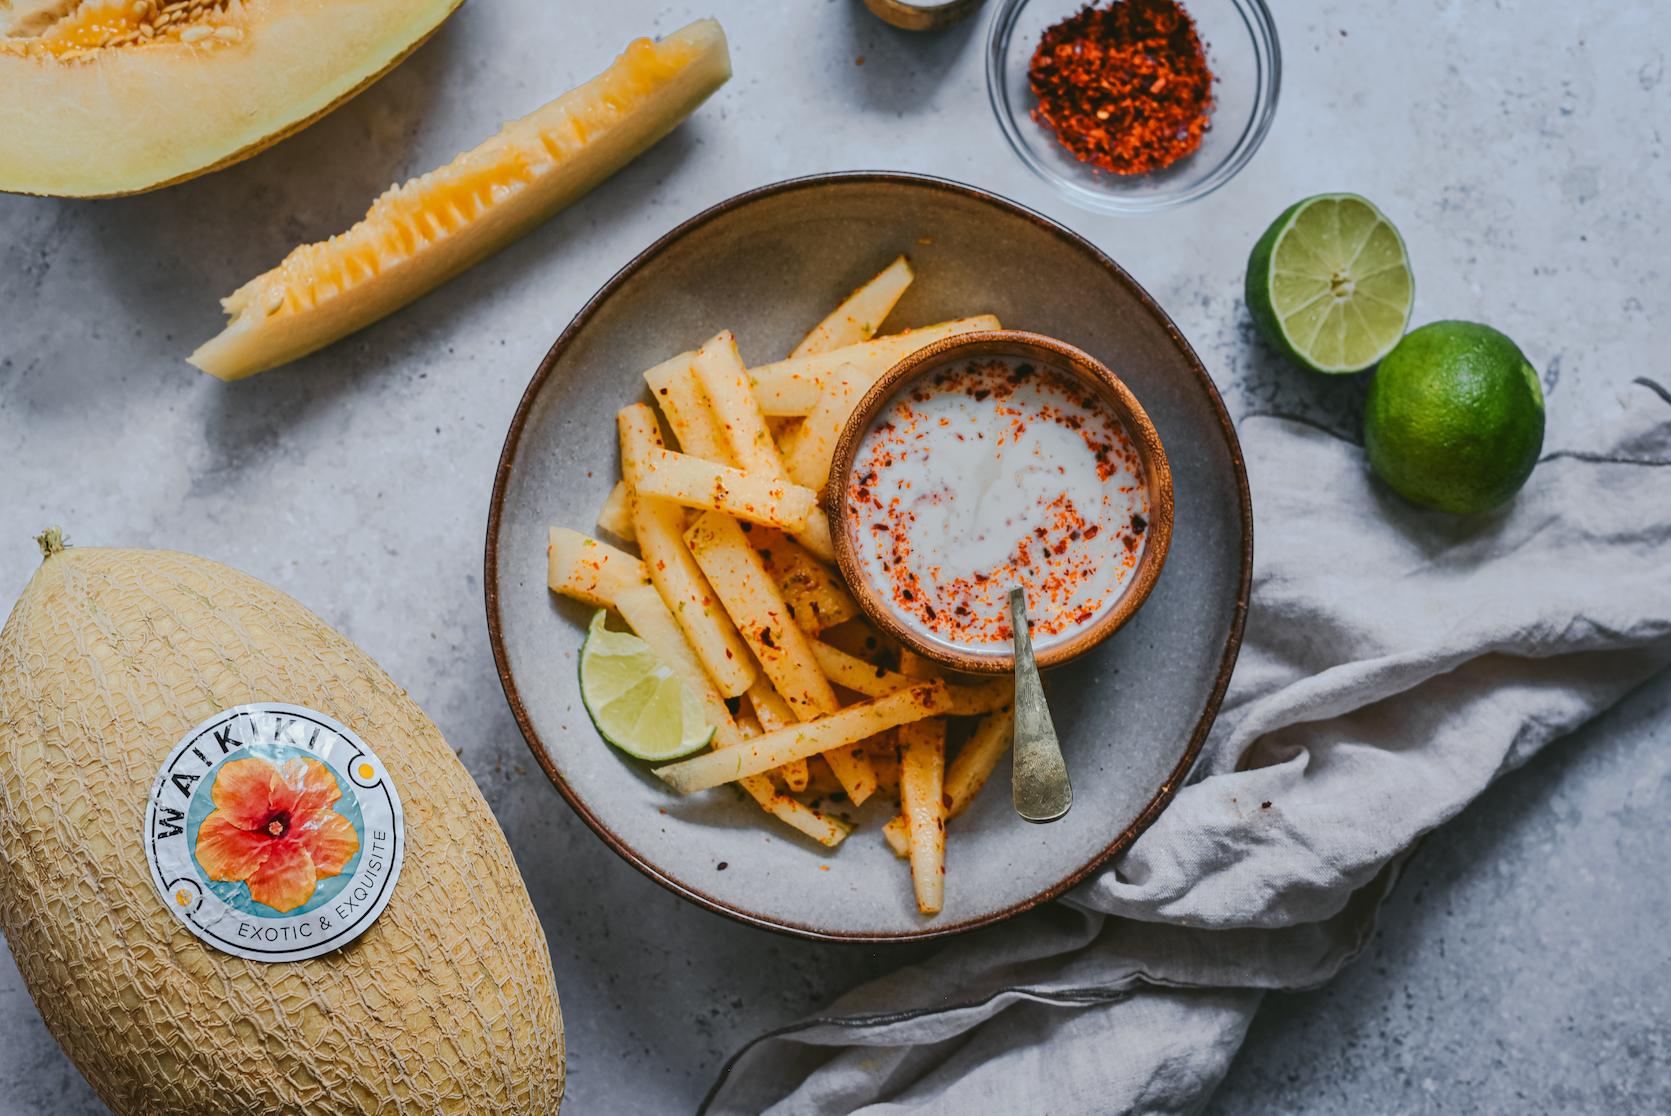 Fries de Melón Waikiki con salsa de yogur